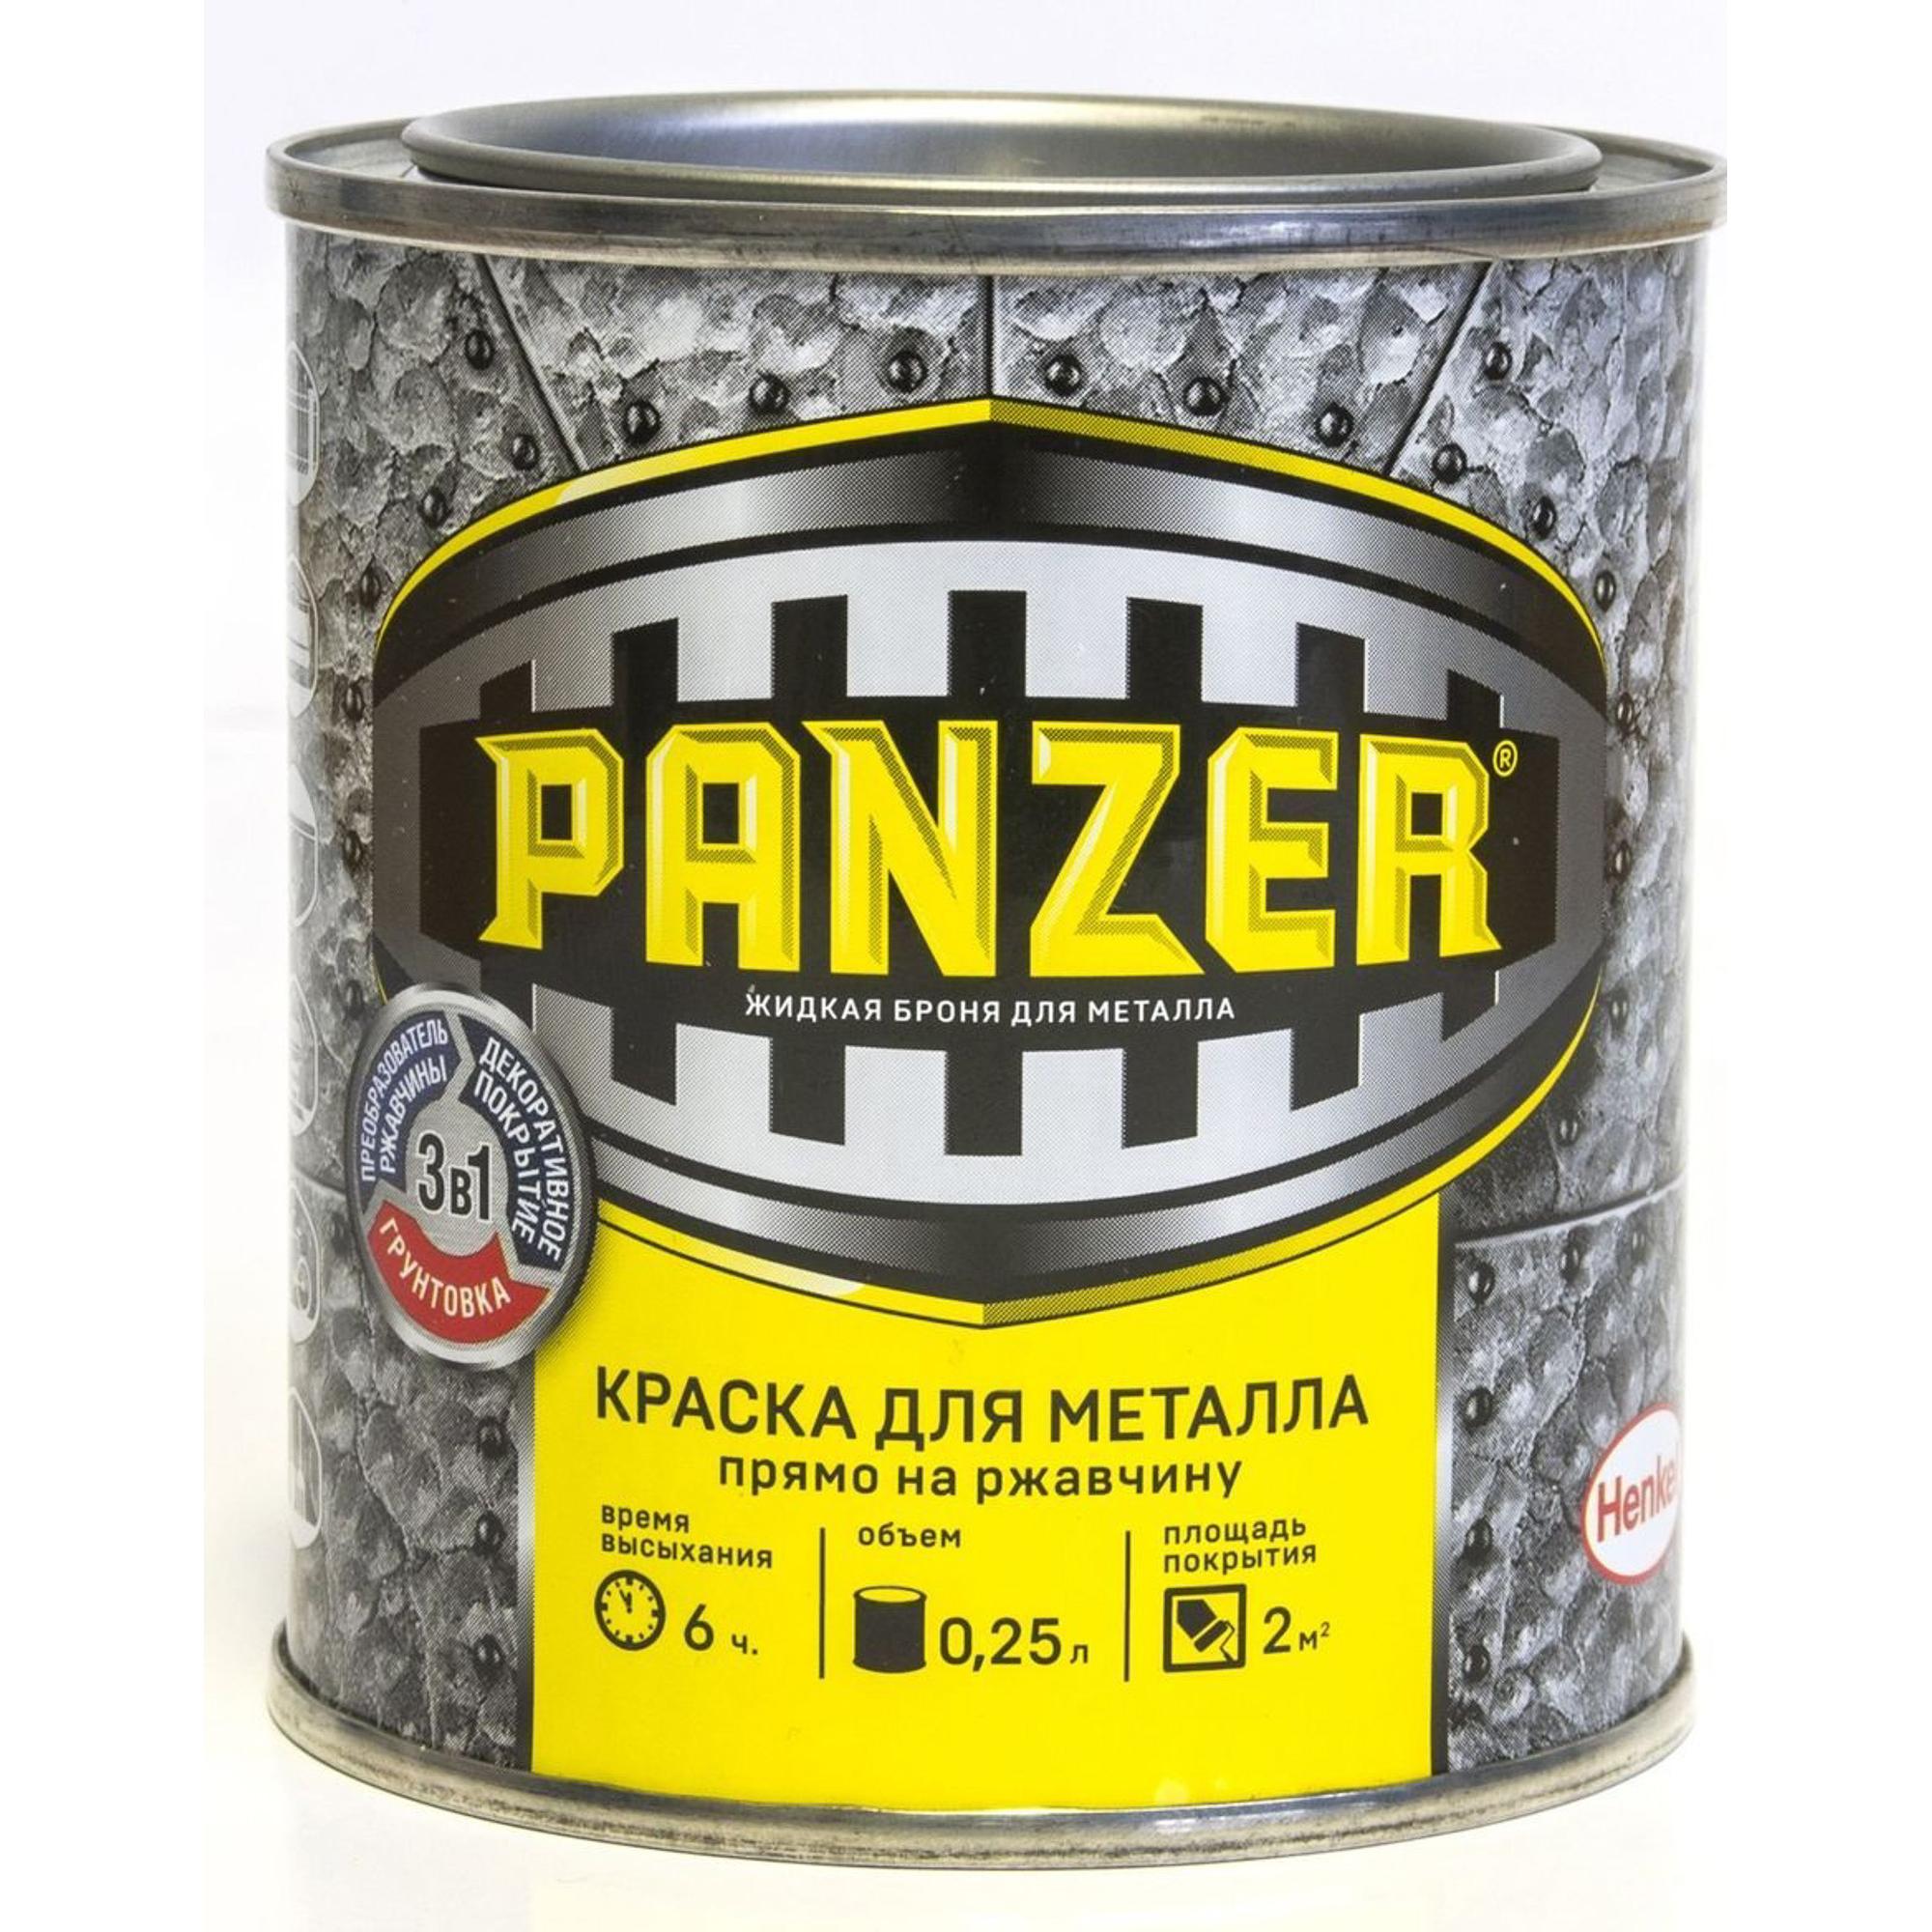 Краска для металла Panzer молотковая красная 0.25 л недорого